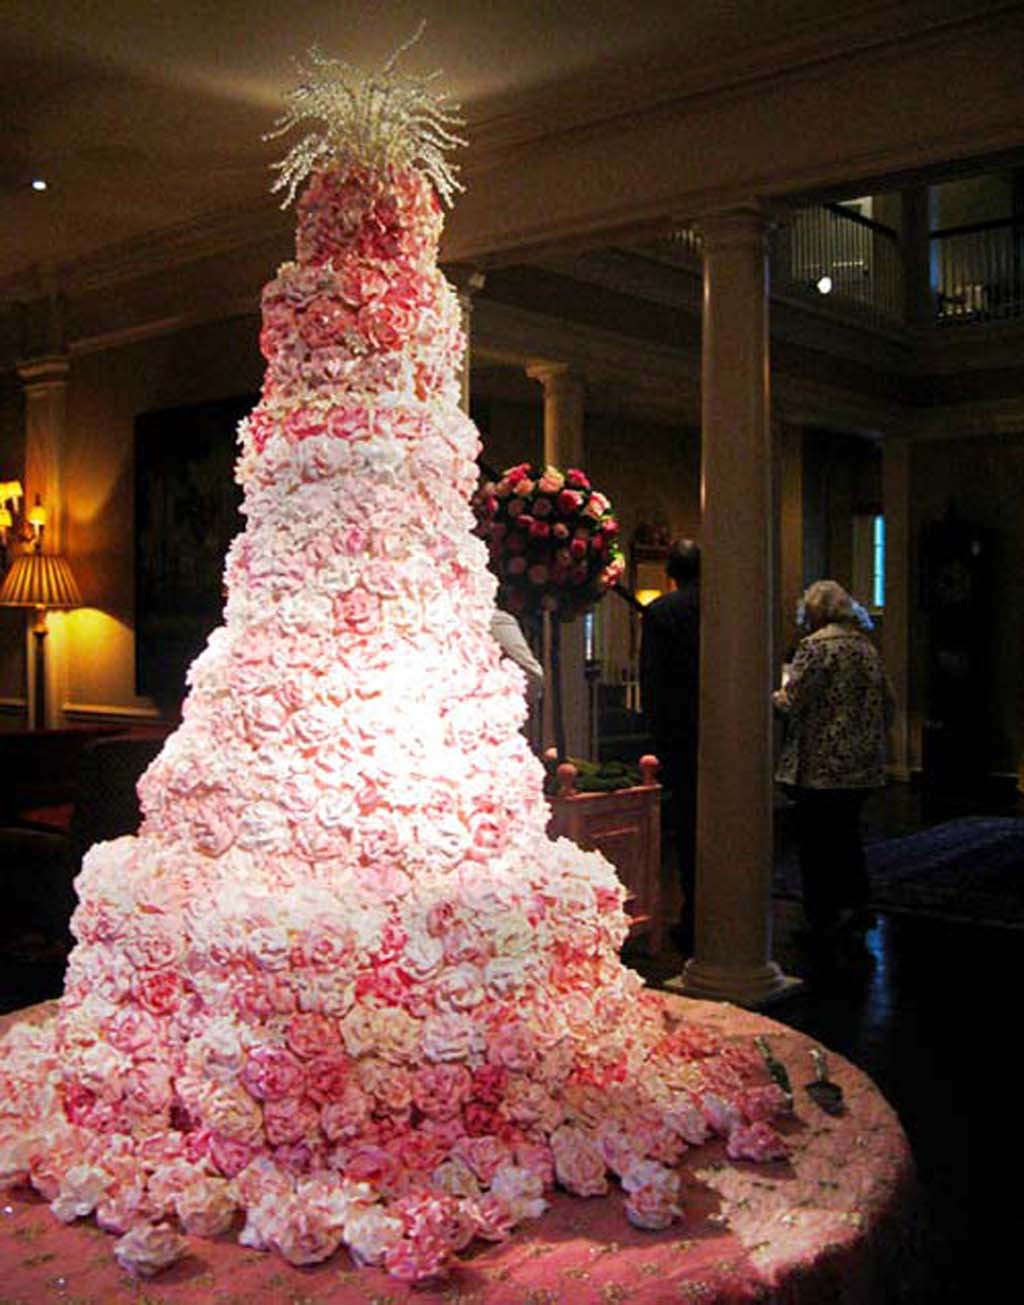 Best Wedding Cakes Ever  Best wedding cakes ever wallpaper 4 wedding cakes wedding